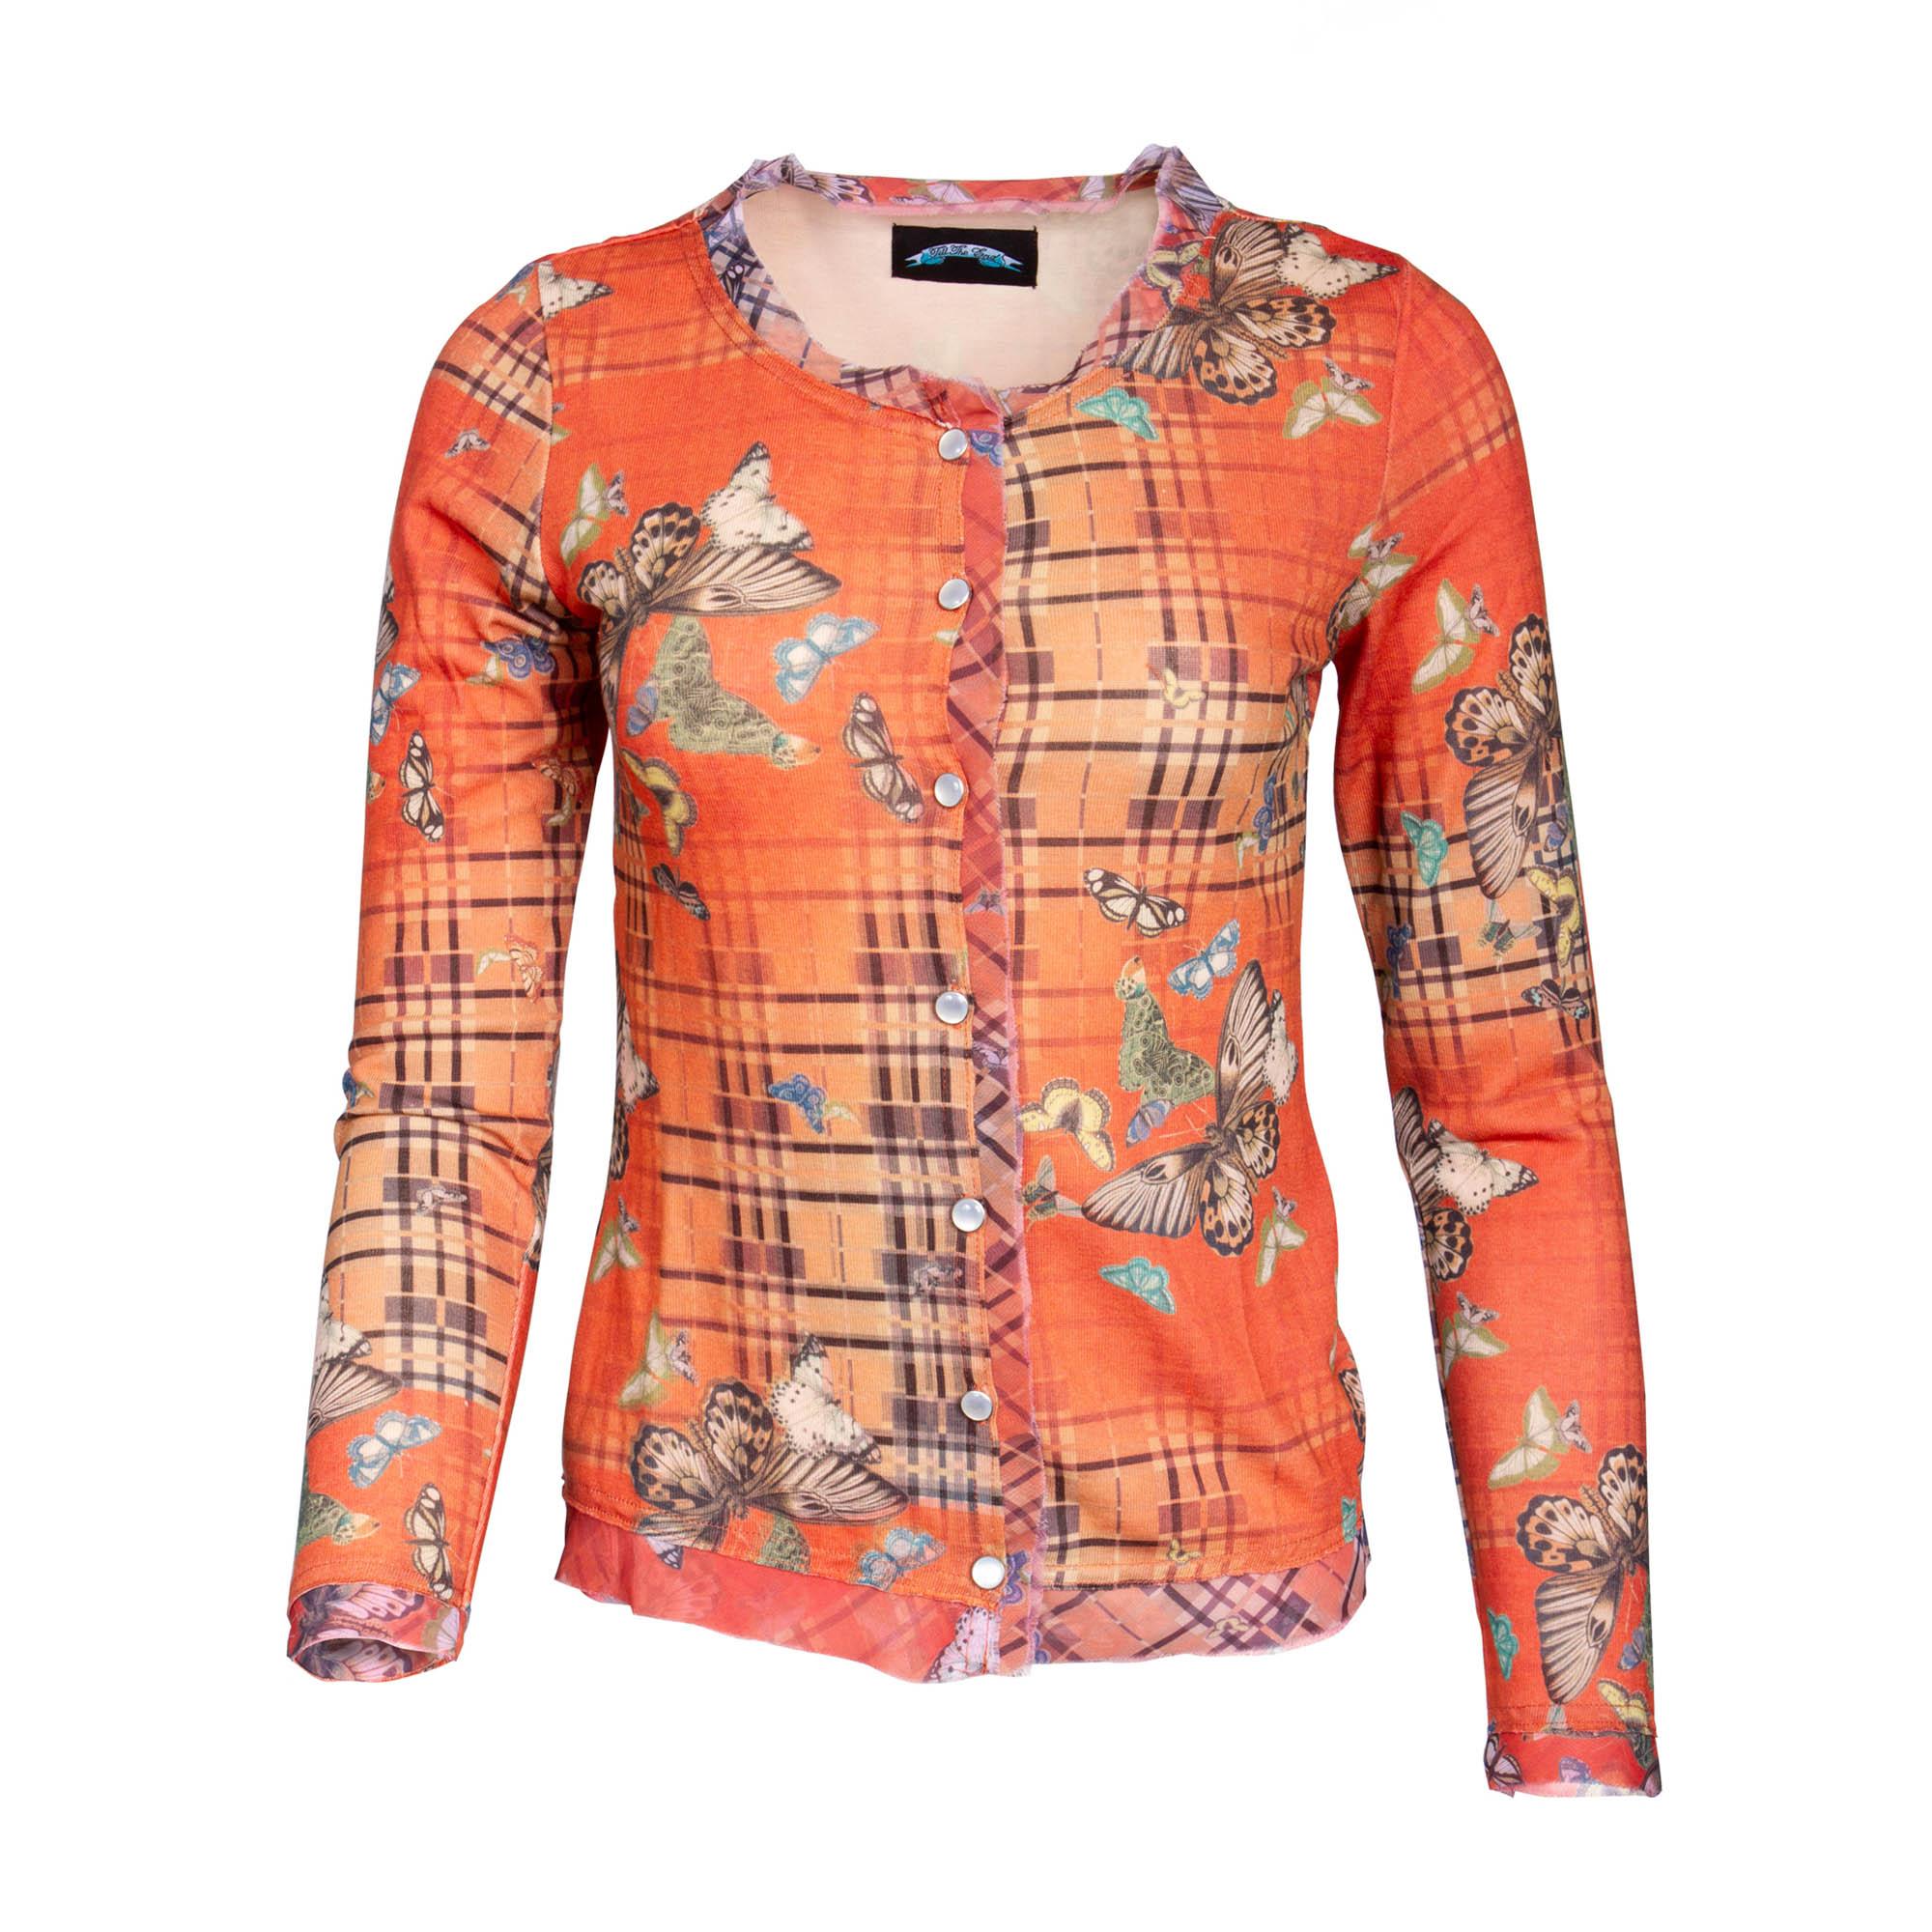 Till The End T09H06-3 Till The End Women's Orange Long Sleeve Button Down Top - Butterfly Design